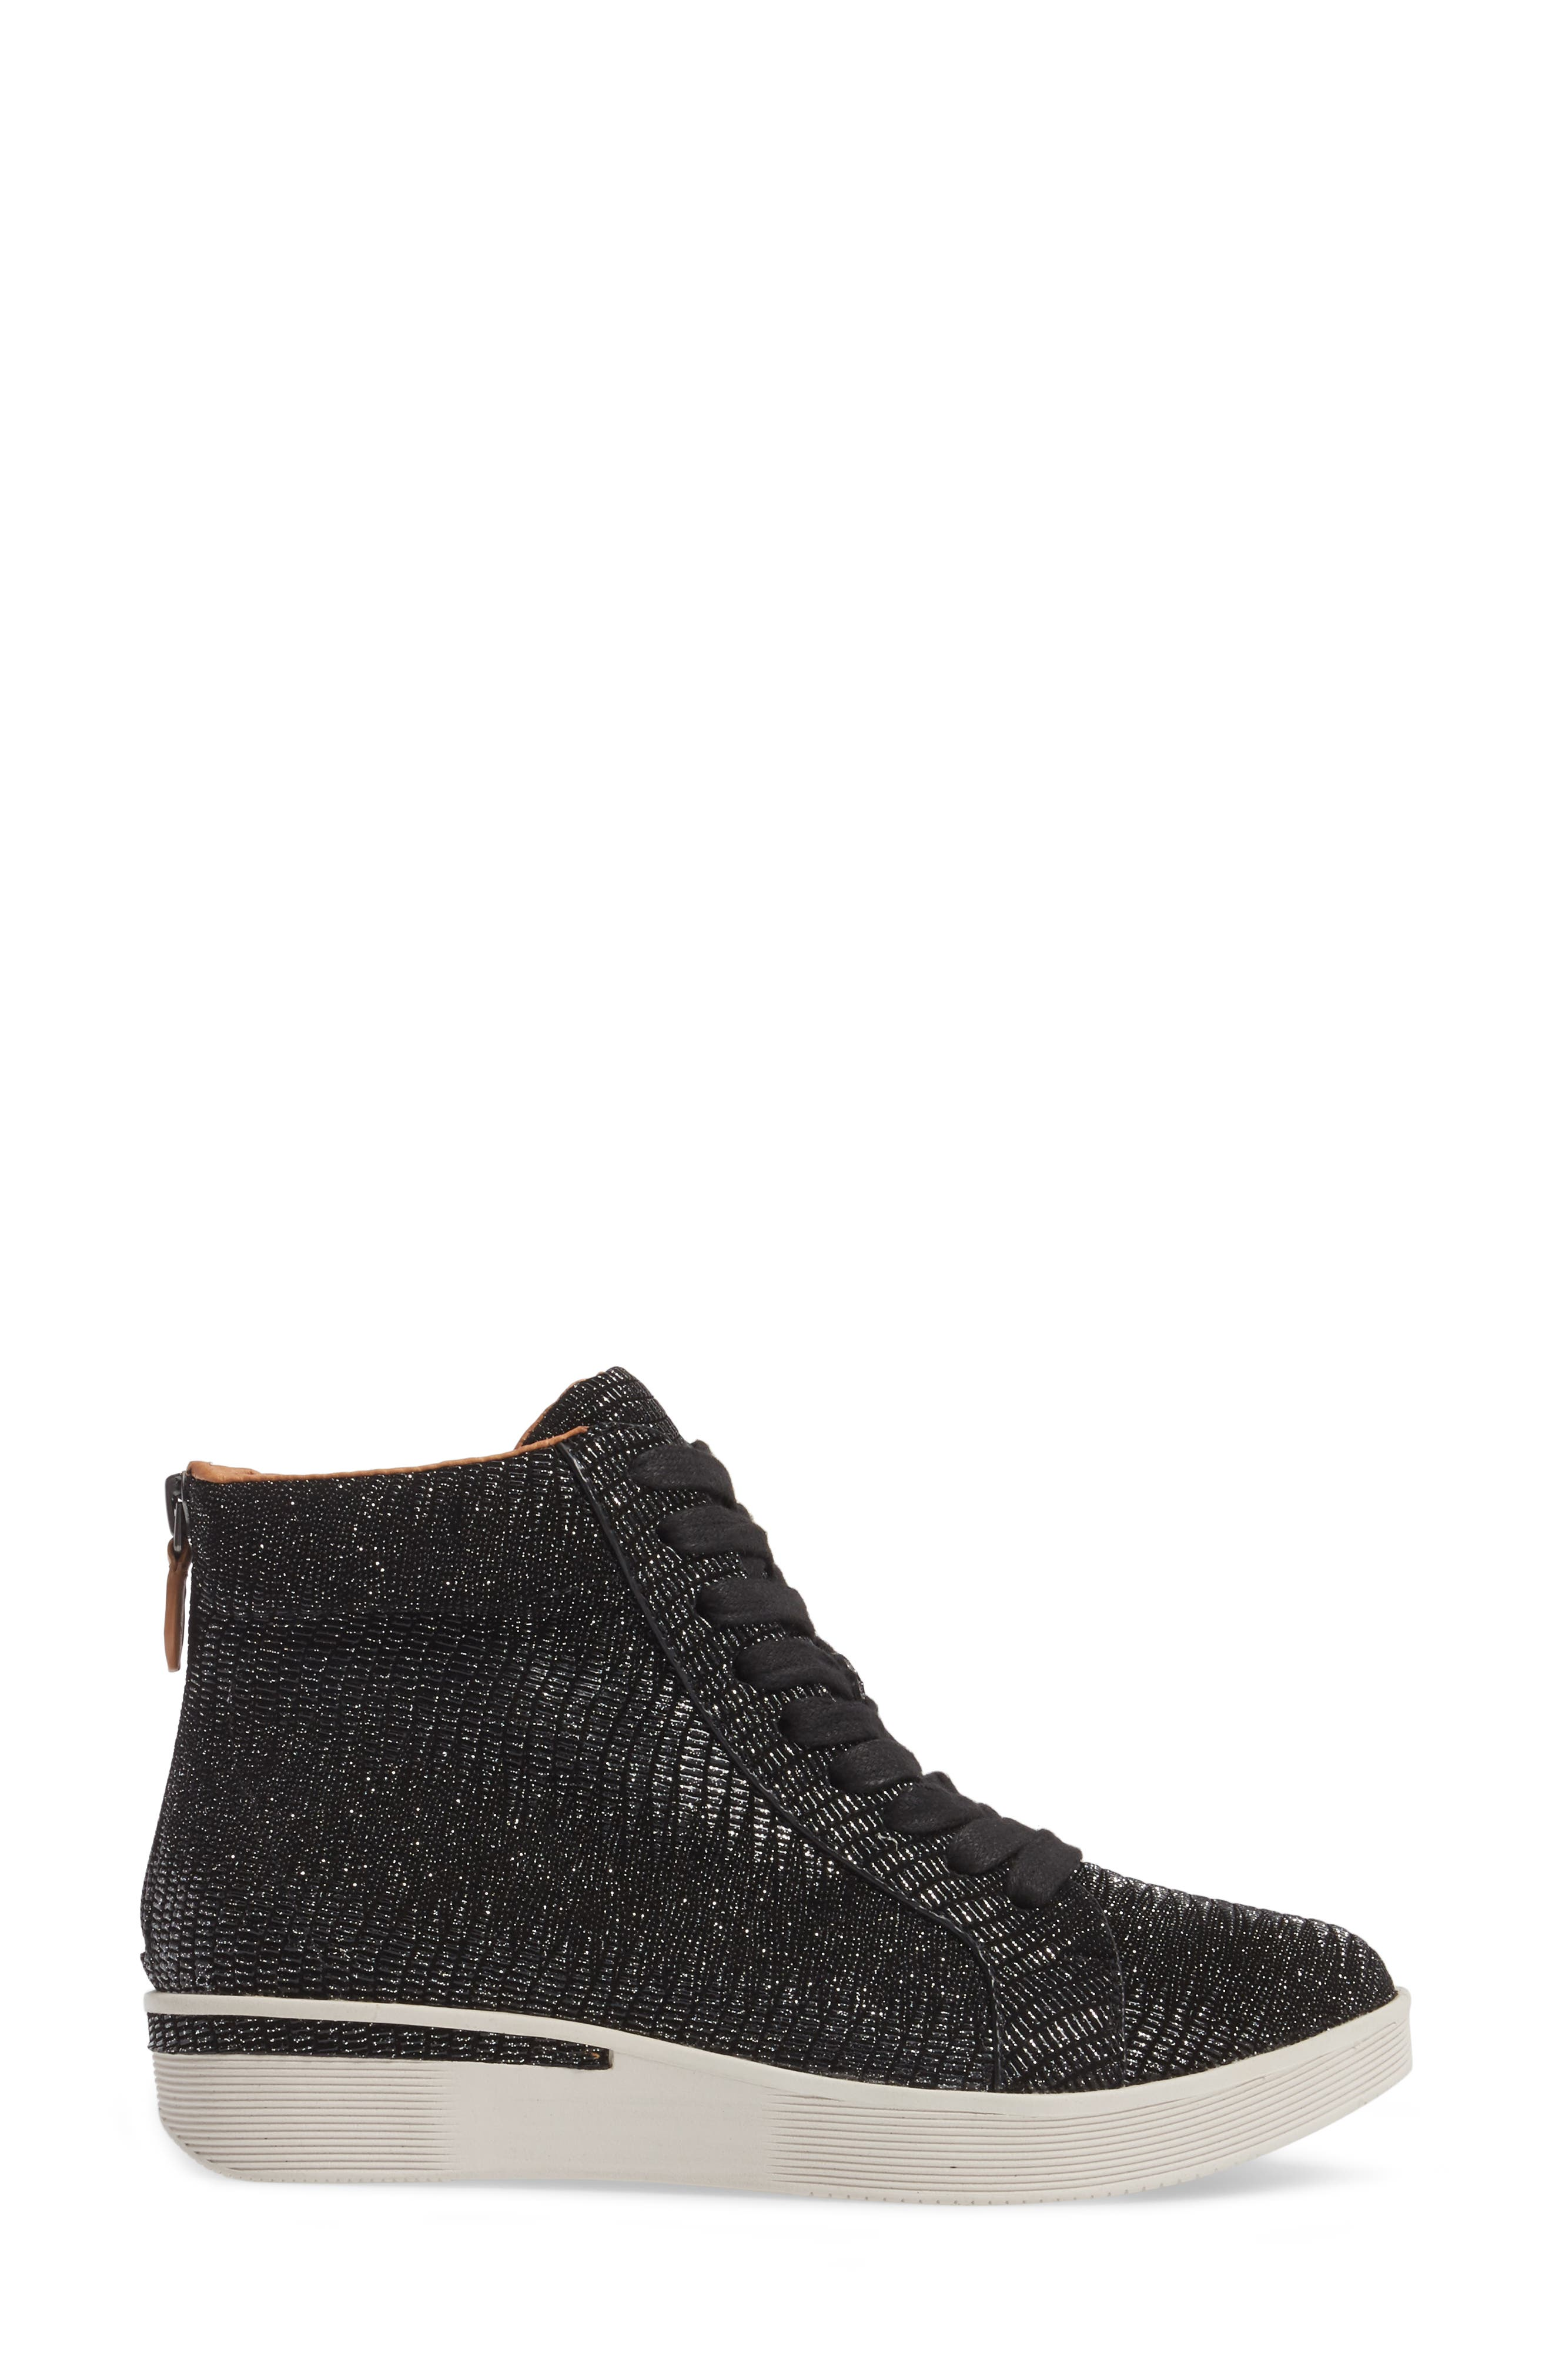 Helka High Top Sneaker,                             Alternate thumbnail 3, color,                             Black Metallic Leather